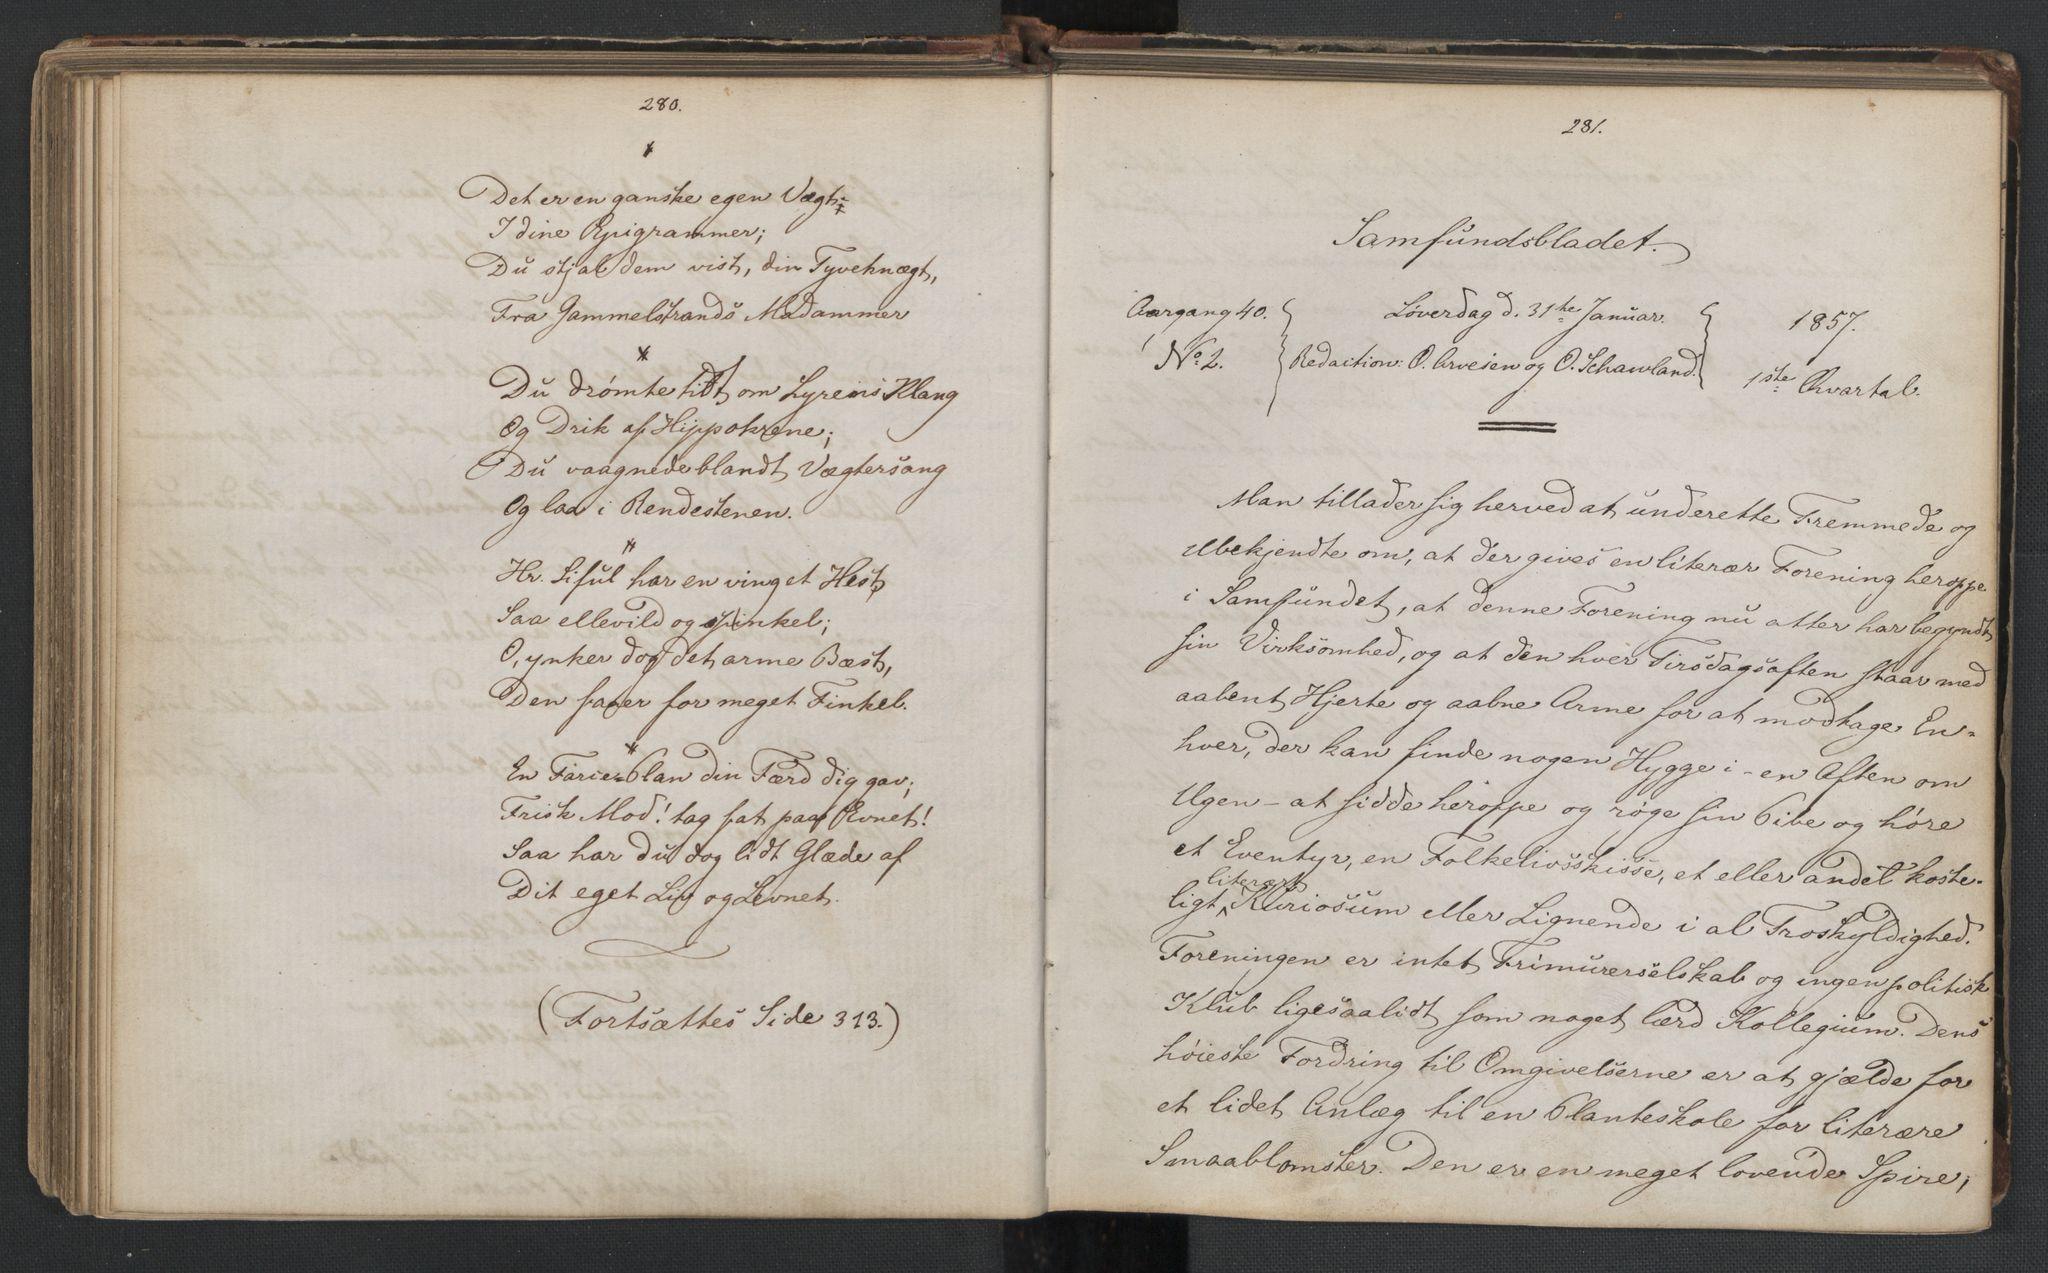 RA, Det Norske Studentersamfund, X/Xa/L0006, 1856-1857, s. 144